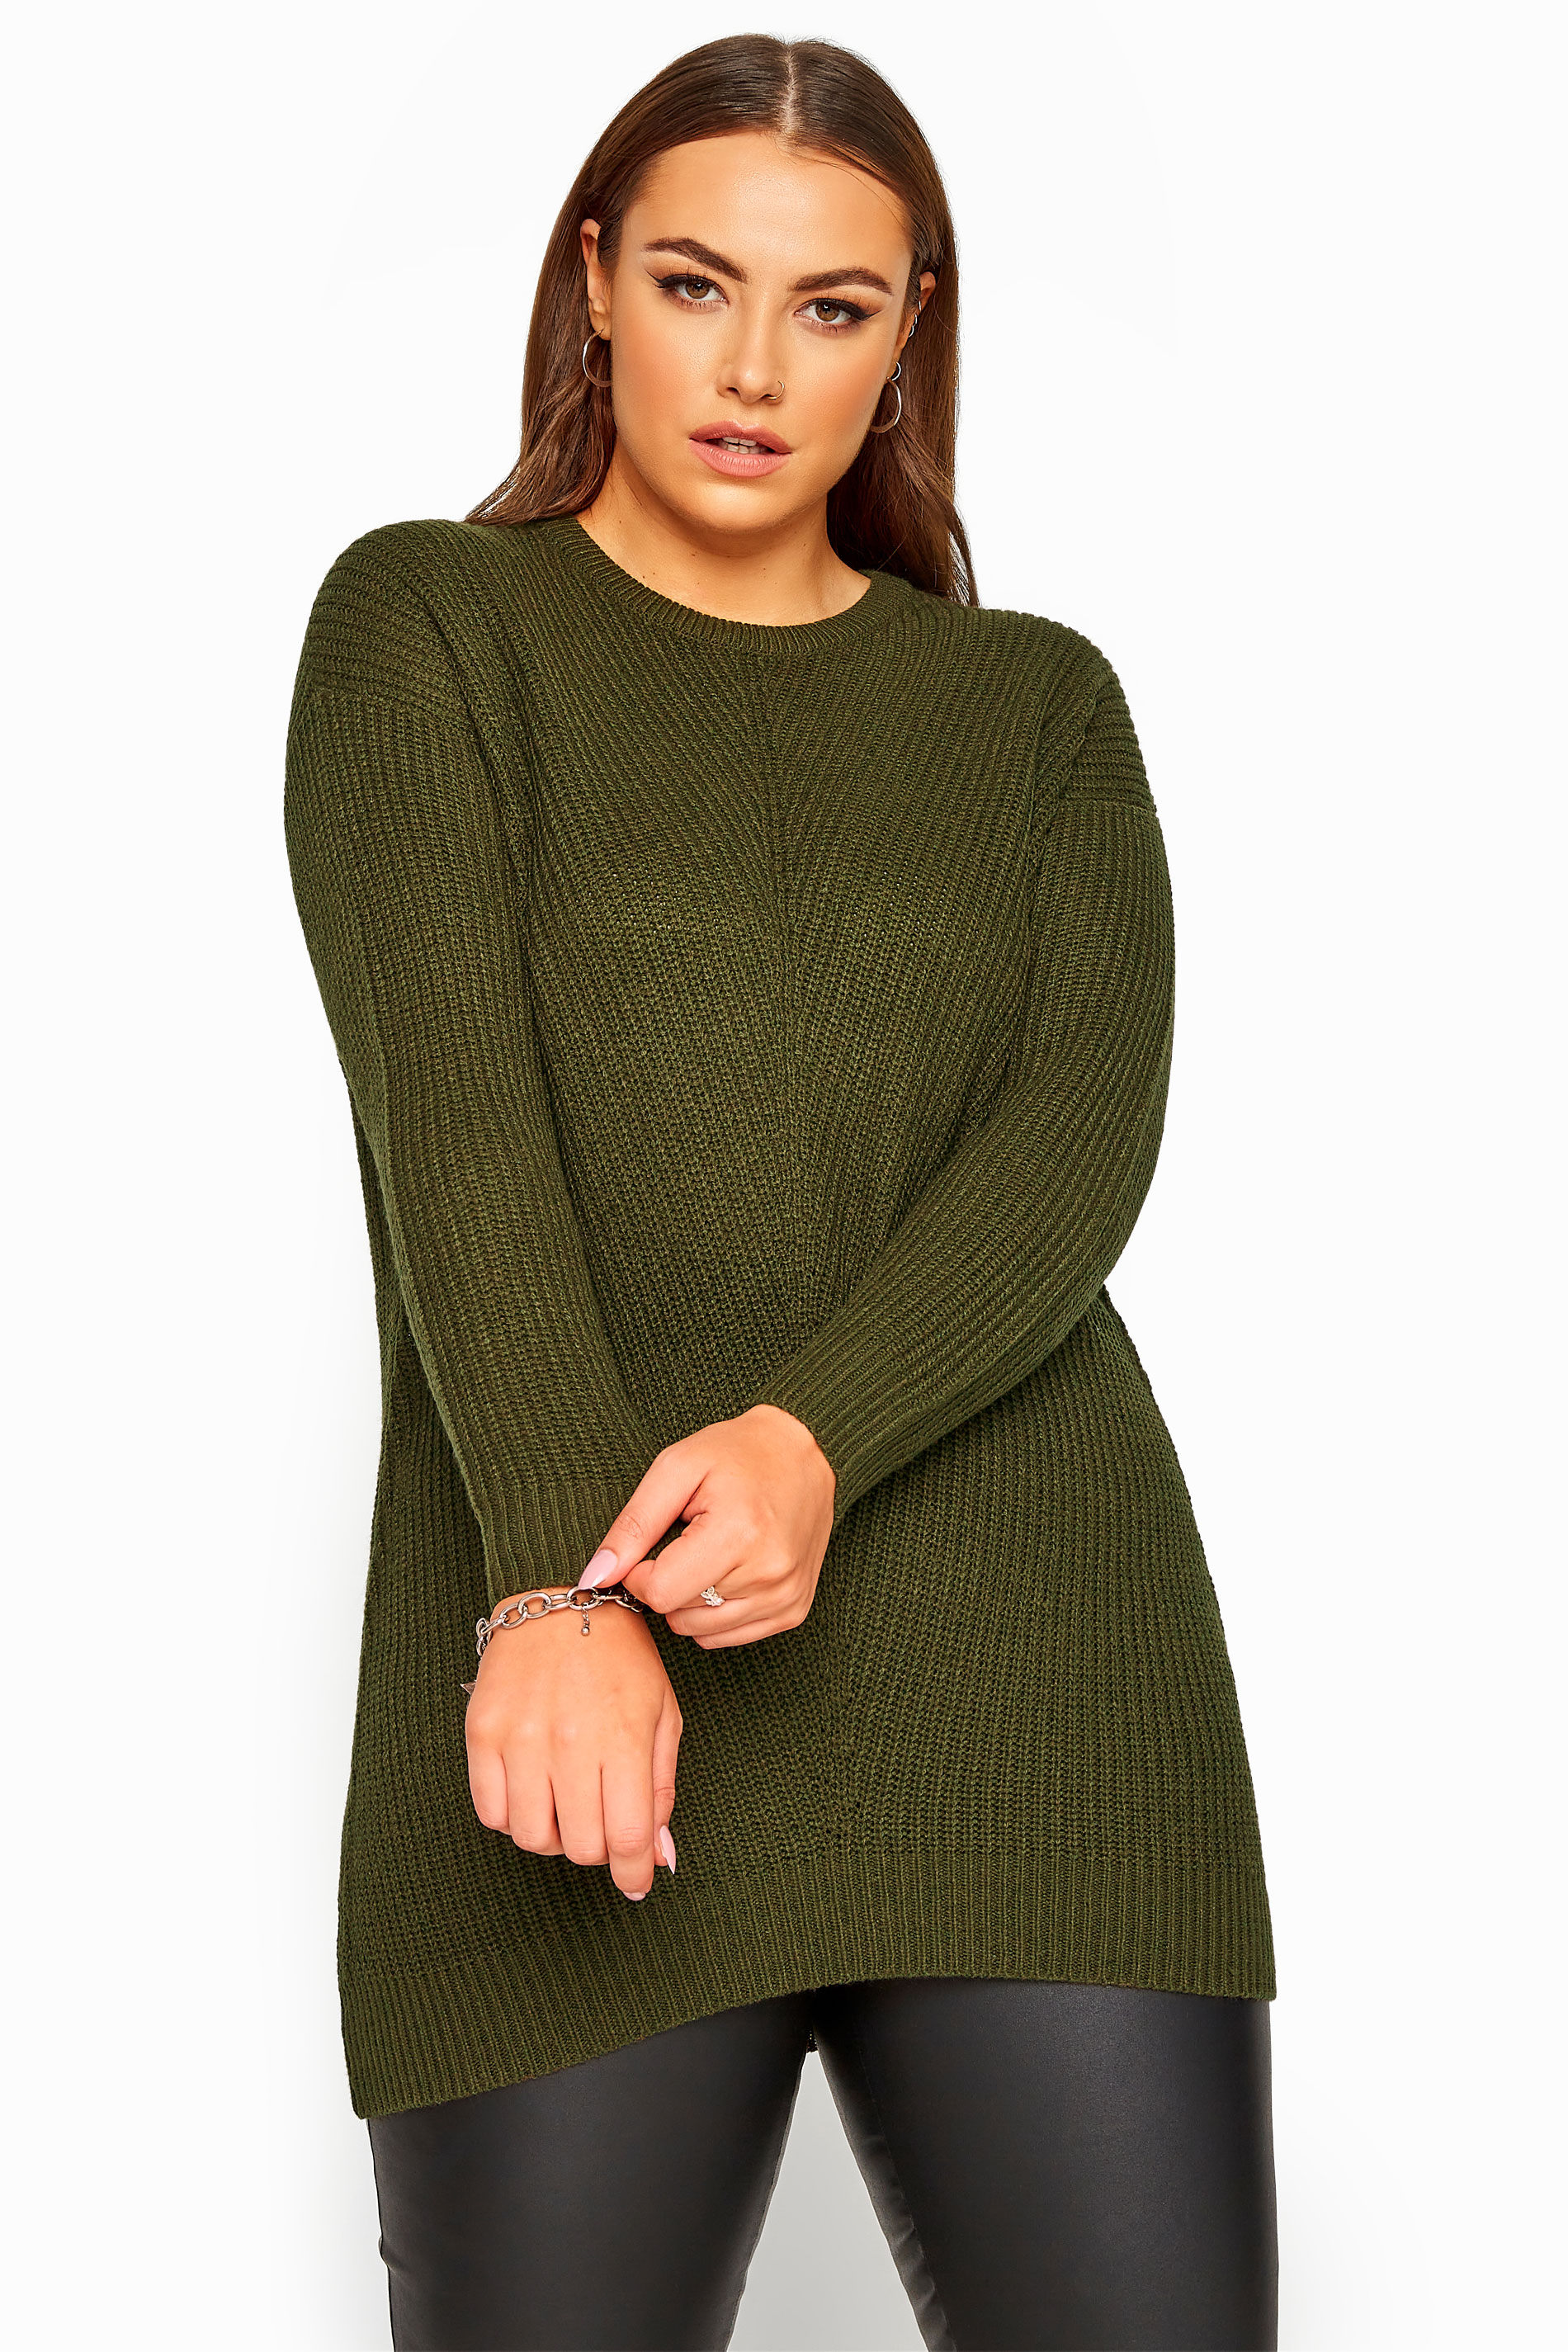 Khaki Green Chunky Knitted Jumper